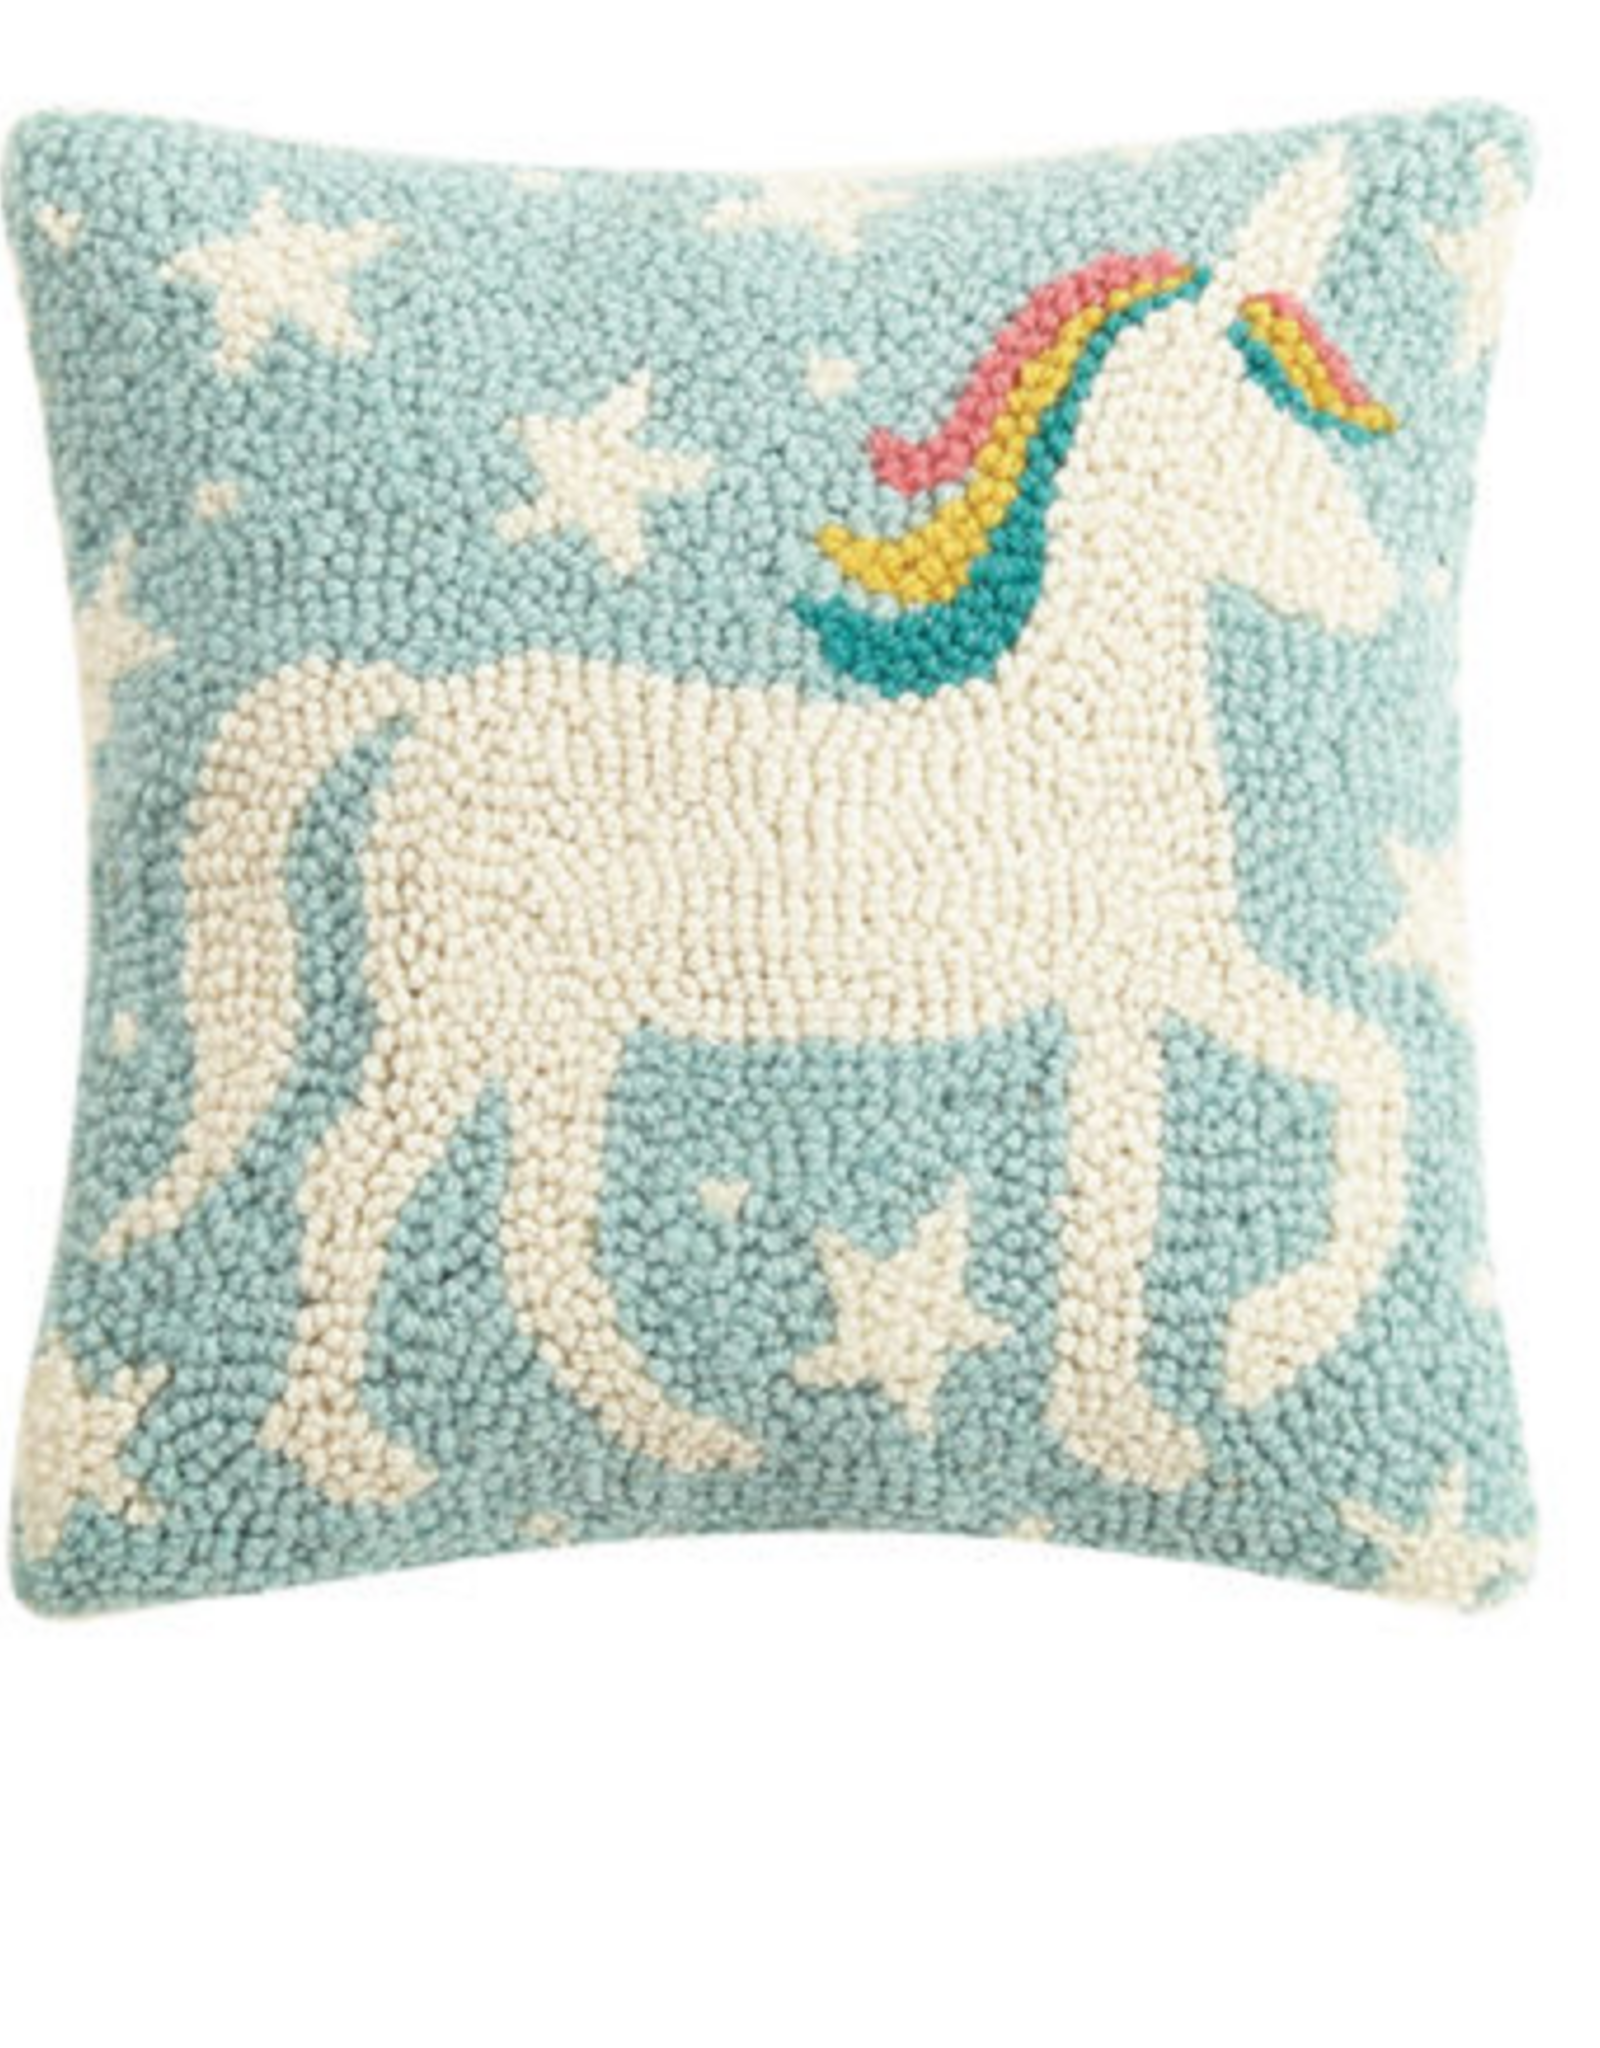 Unicorn Magic Handcrafted Hook Pillow